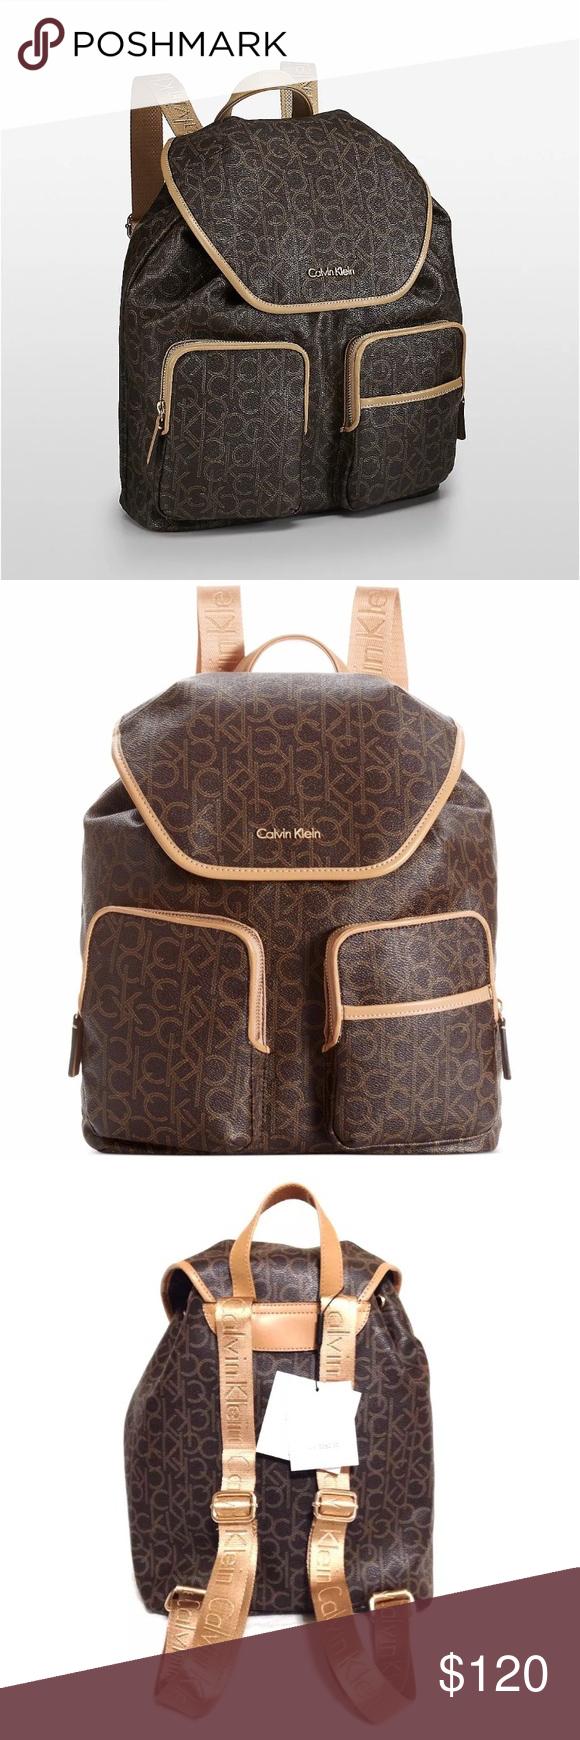 61f7d0d05c Calvin Klein CK logo backpack leather luggage brwn Calvin Klein signature CK  logo luggage backpack COLOR